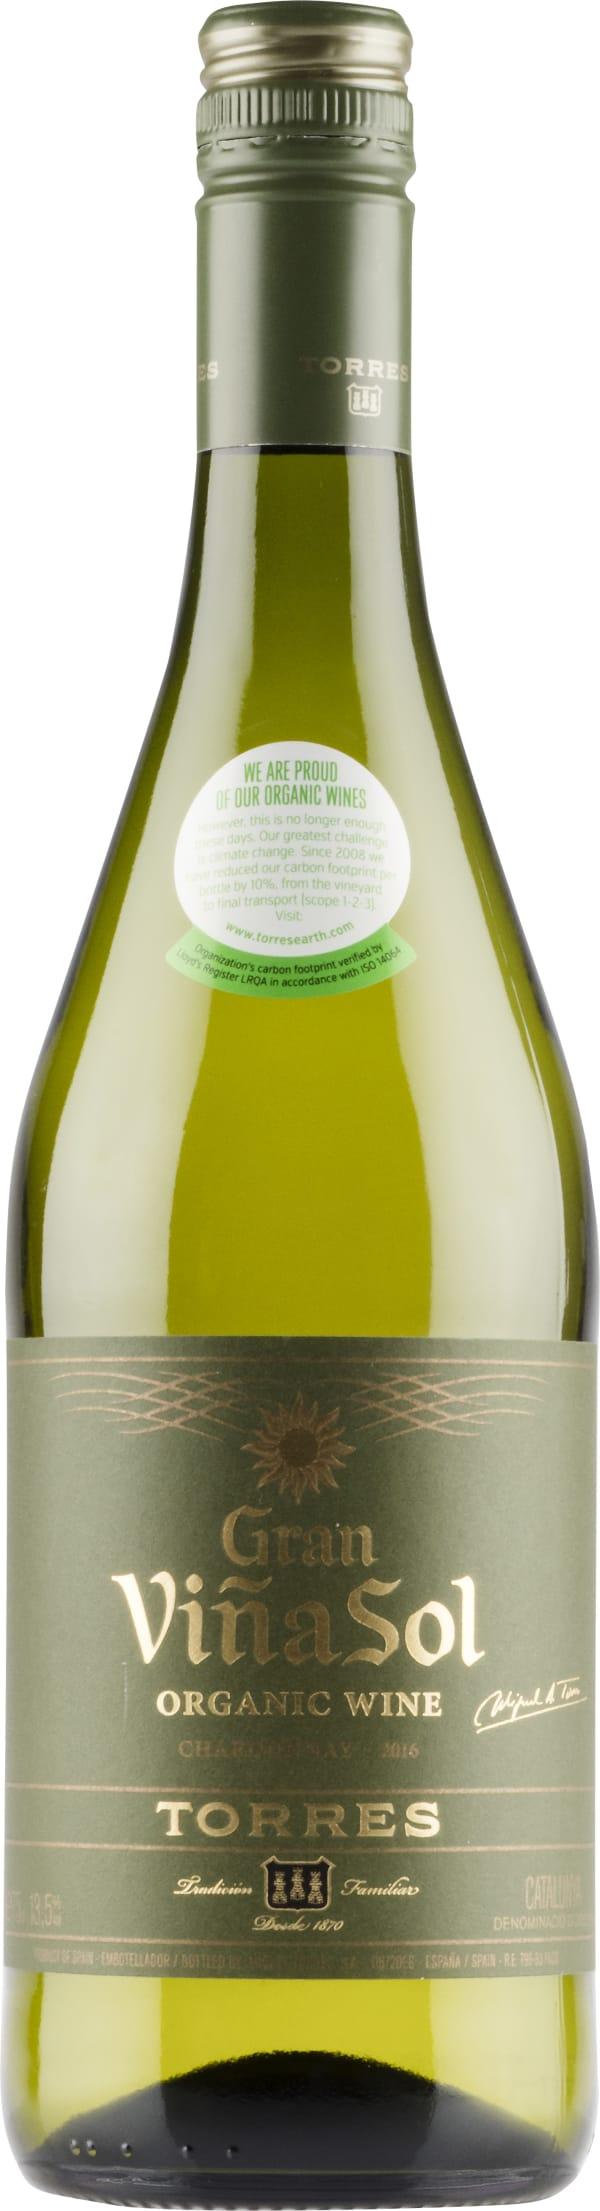 Torres Gran Viña Sol Chardonnay 2016